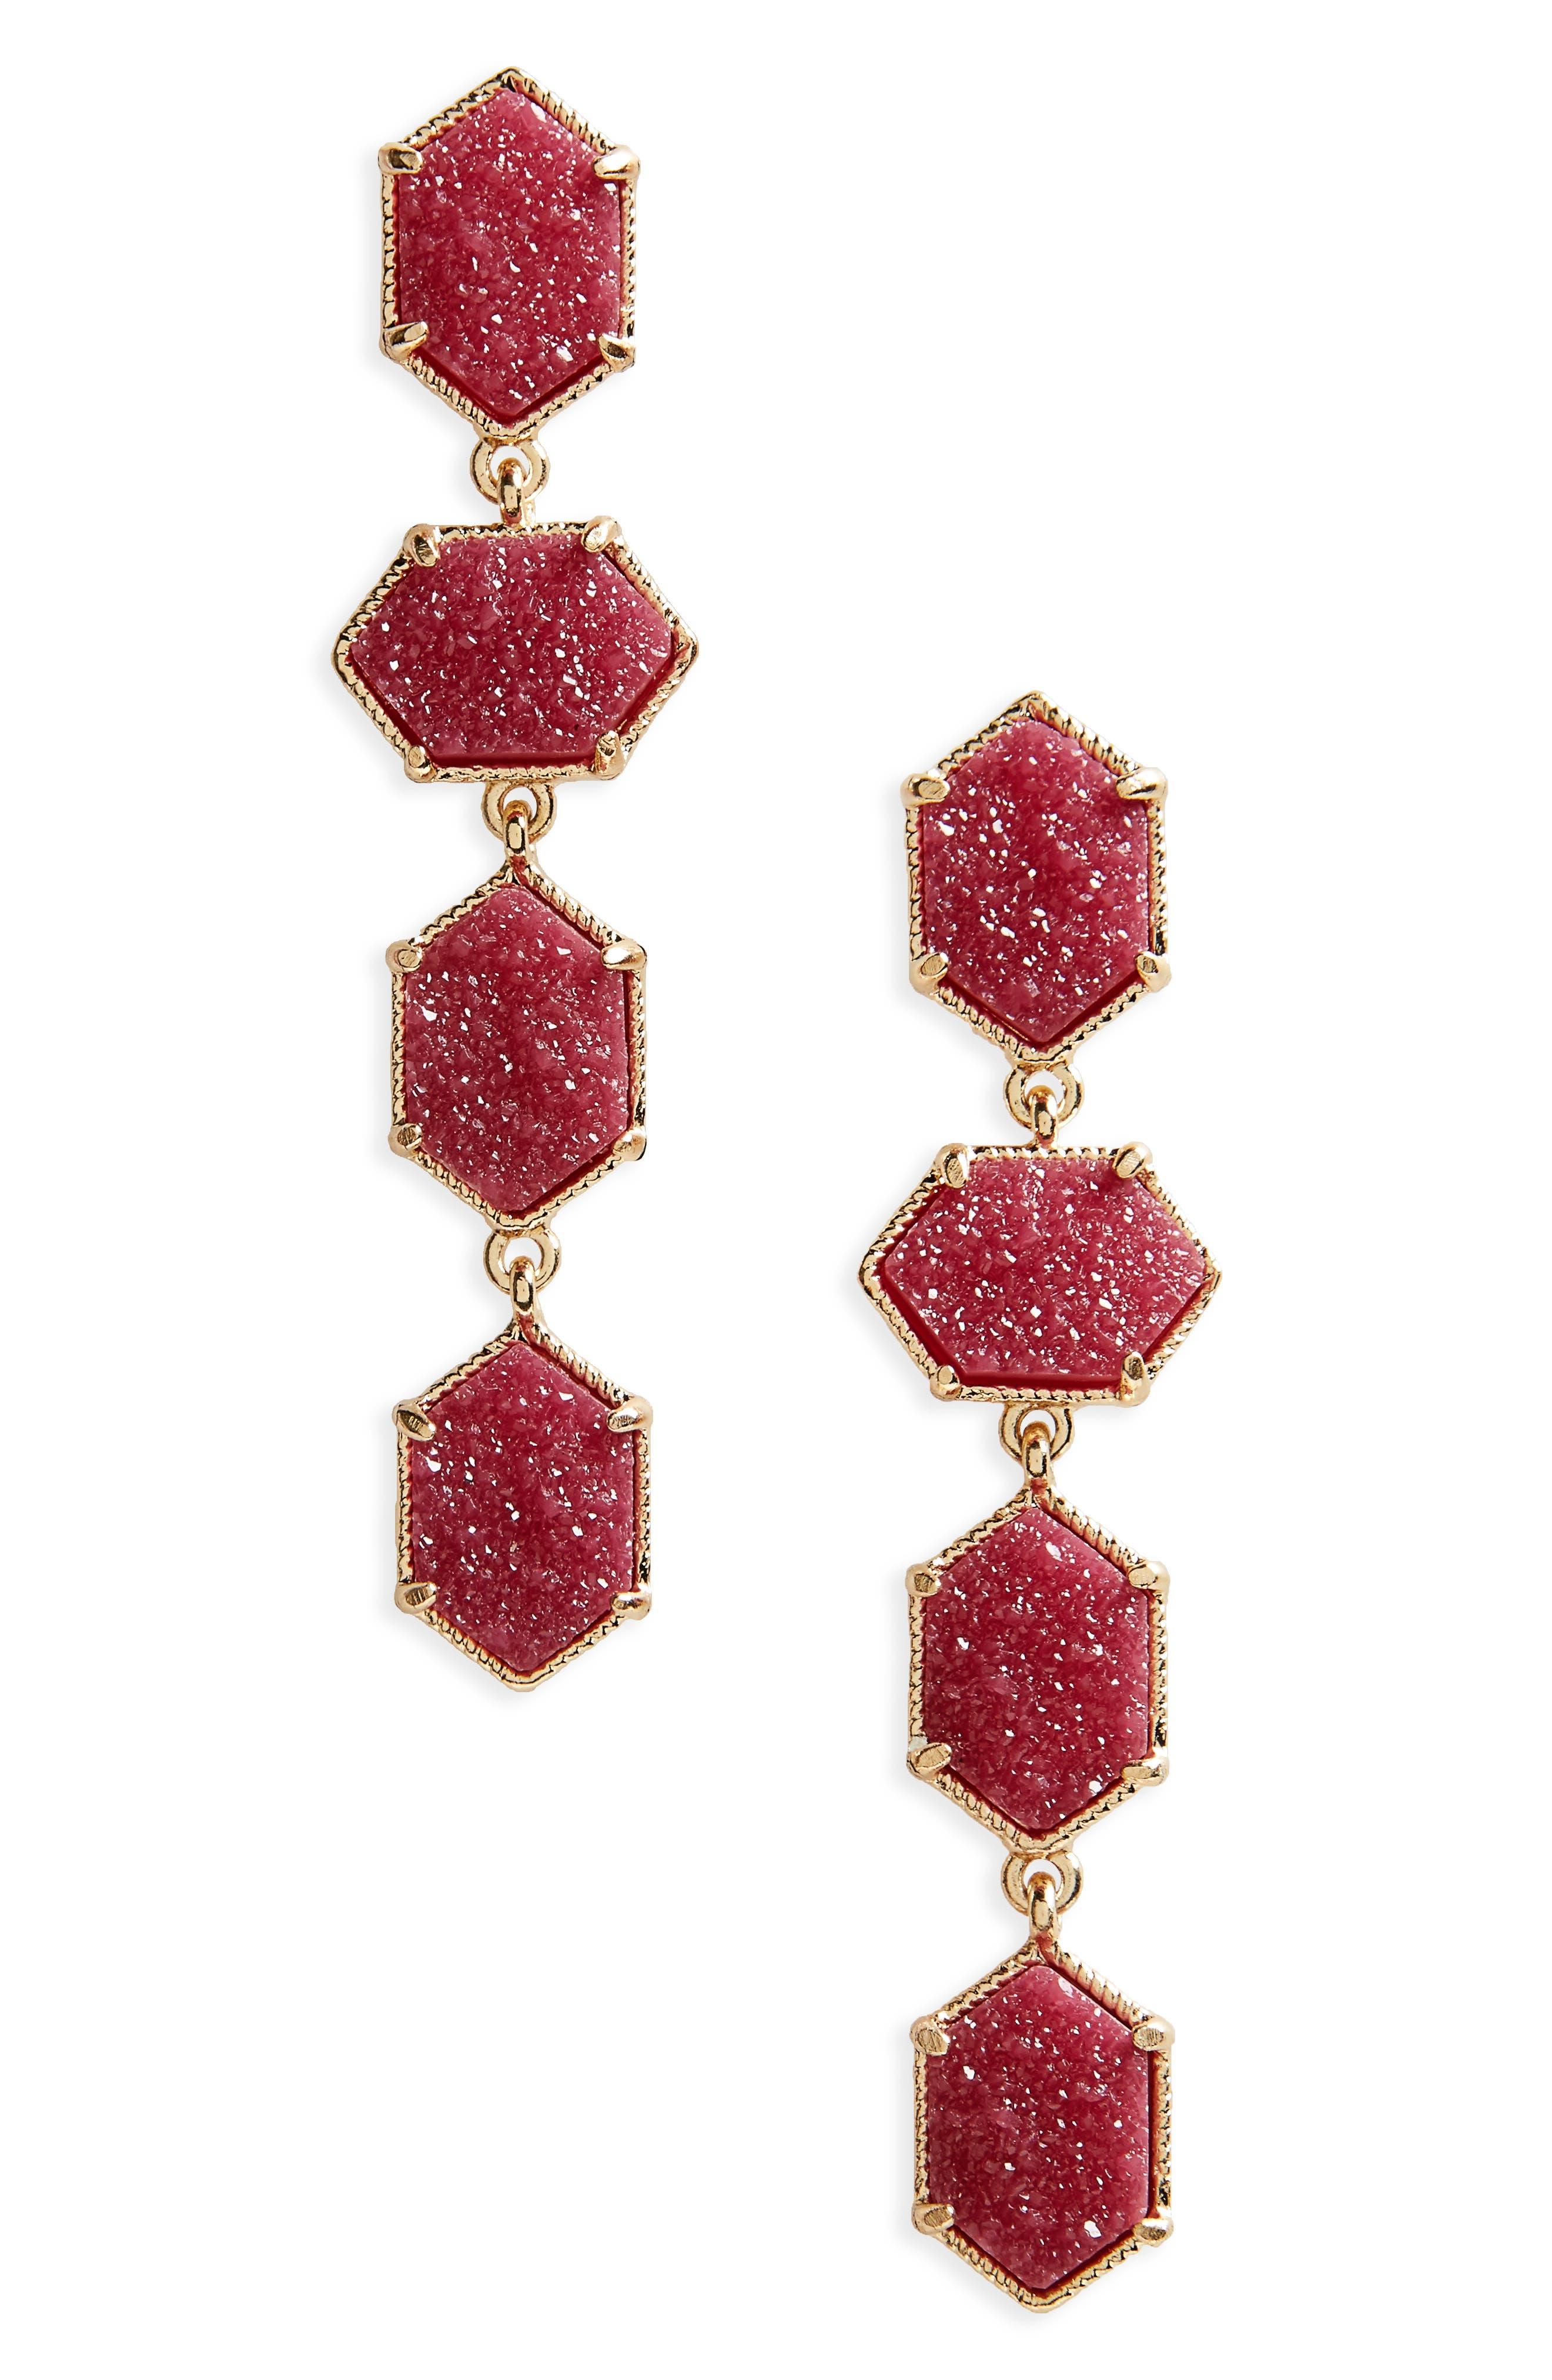 Faux Drusy Stone Drop Earrings,                         Main,                         color, Fushia